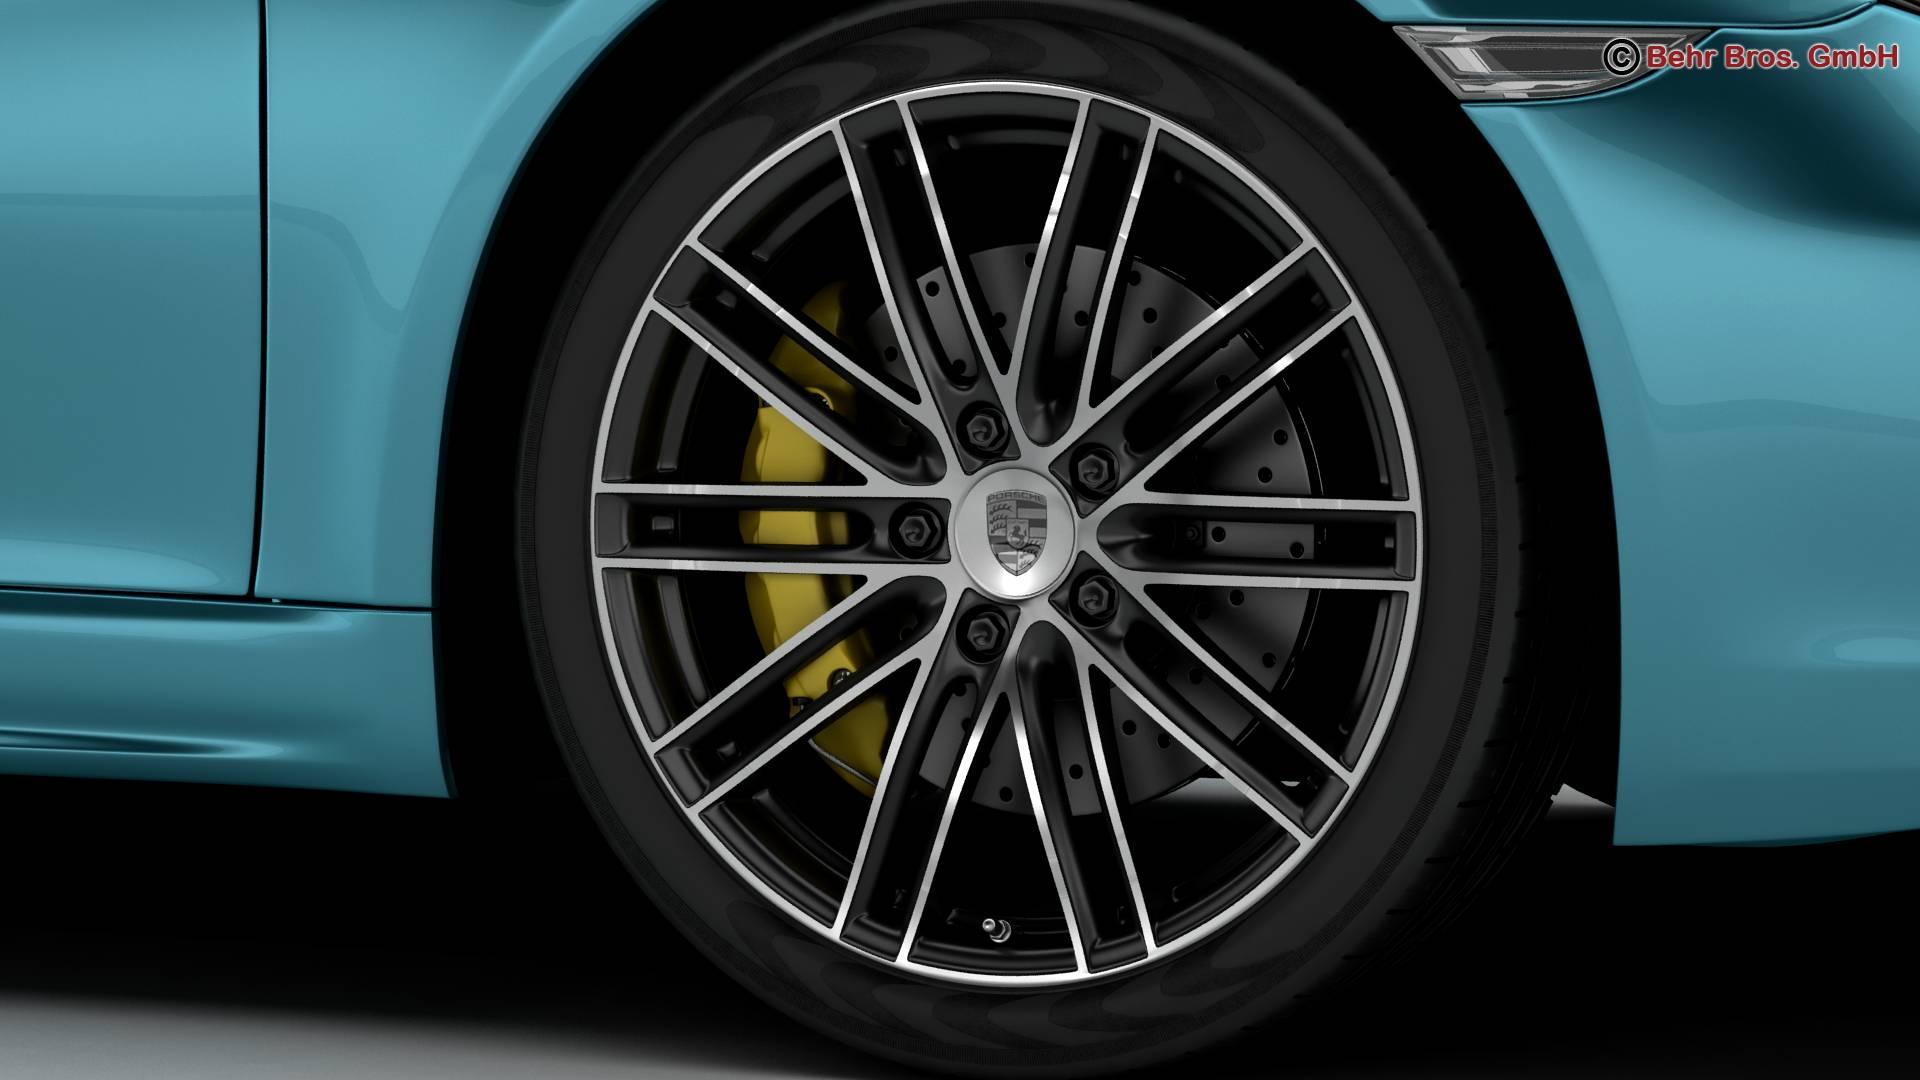 porsche 718 cayman s 2017 3d model 3ds max fbx c4d lwo ma mb obj 220110